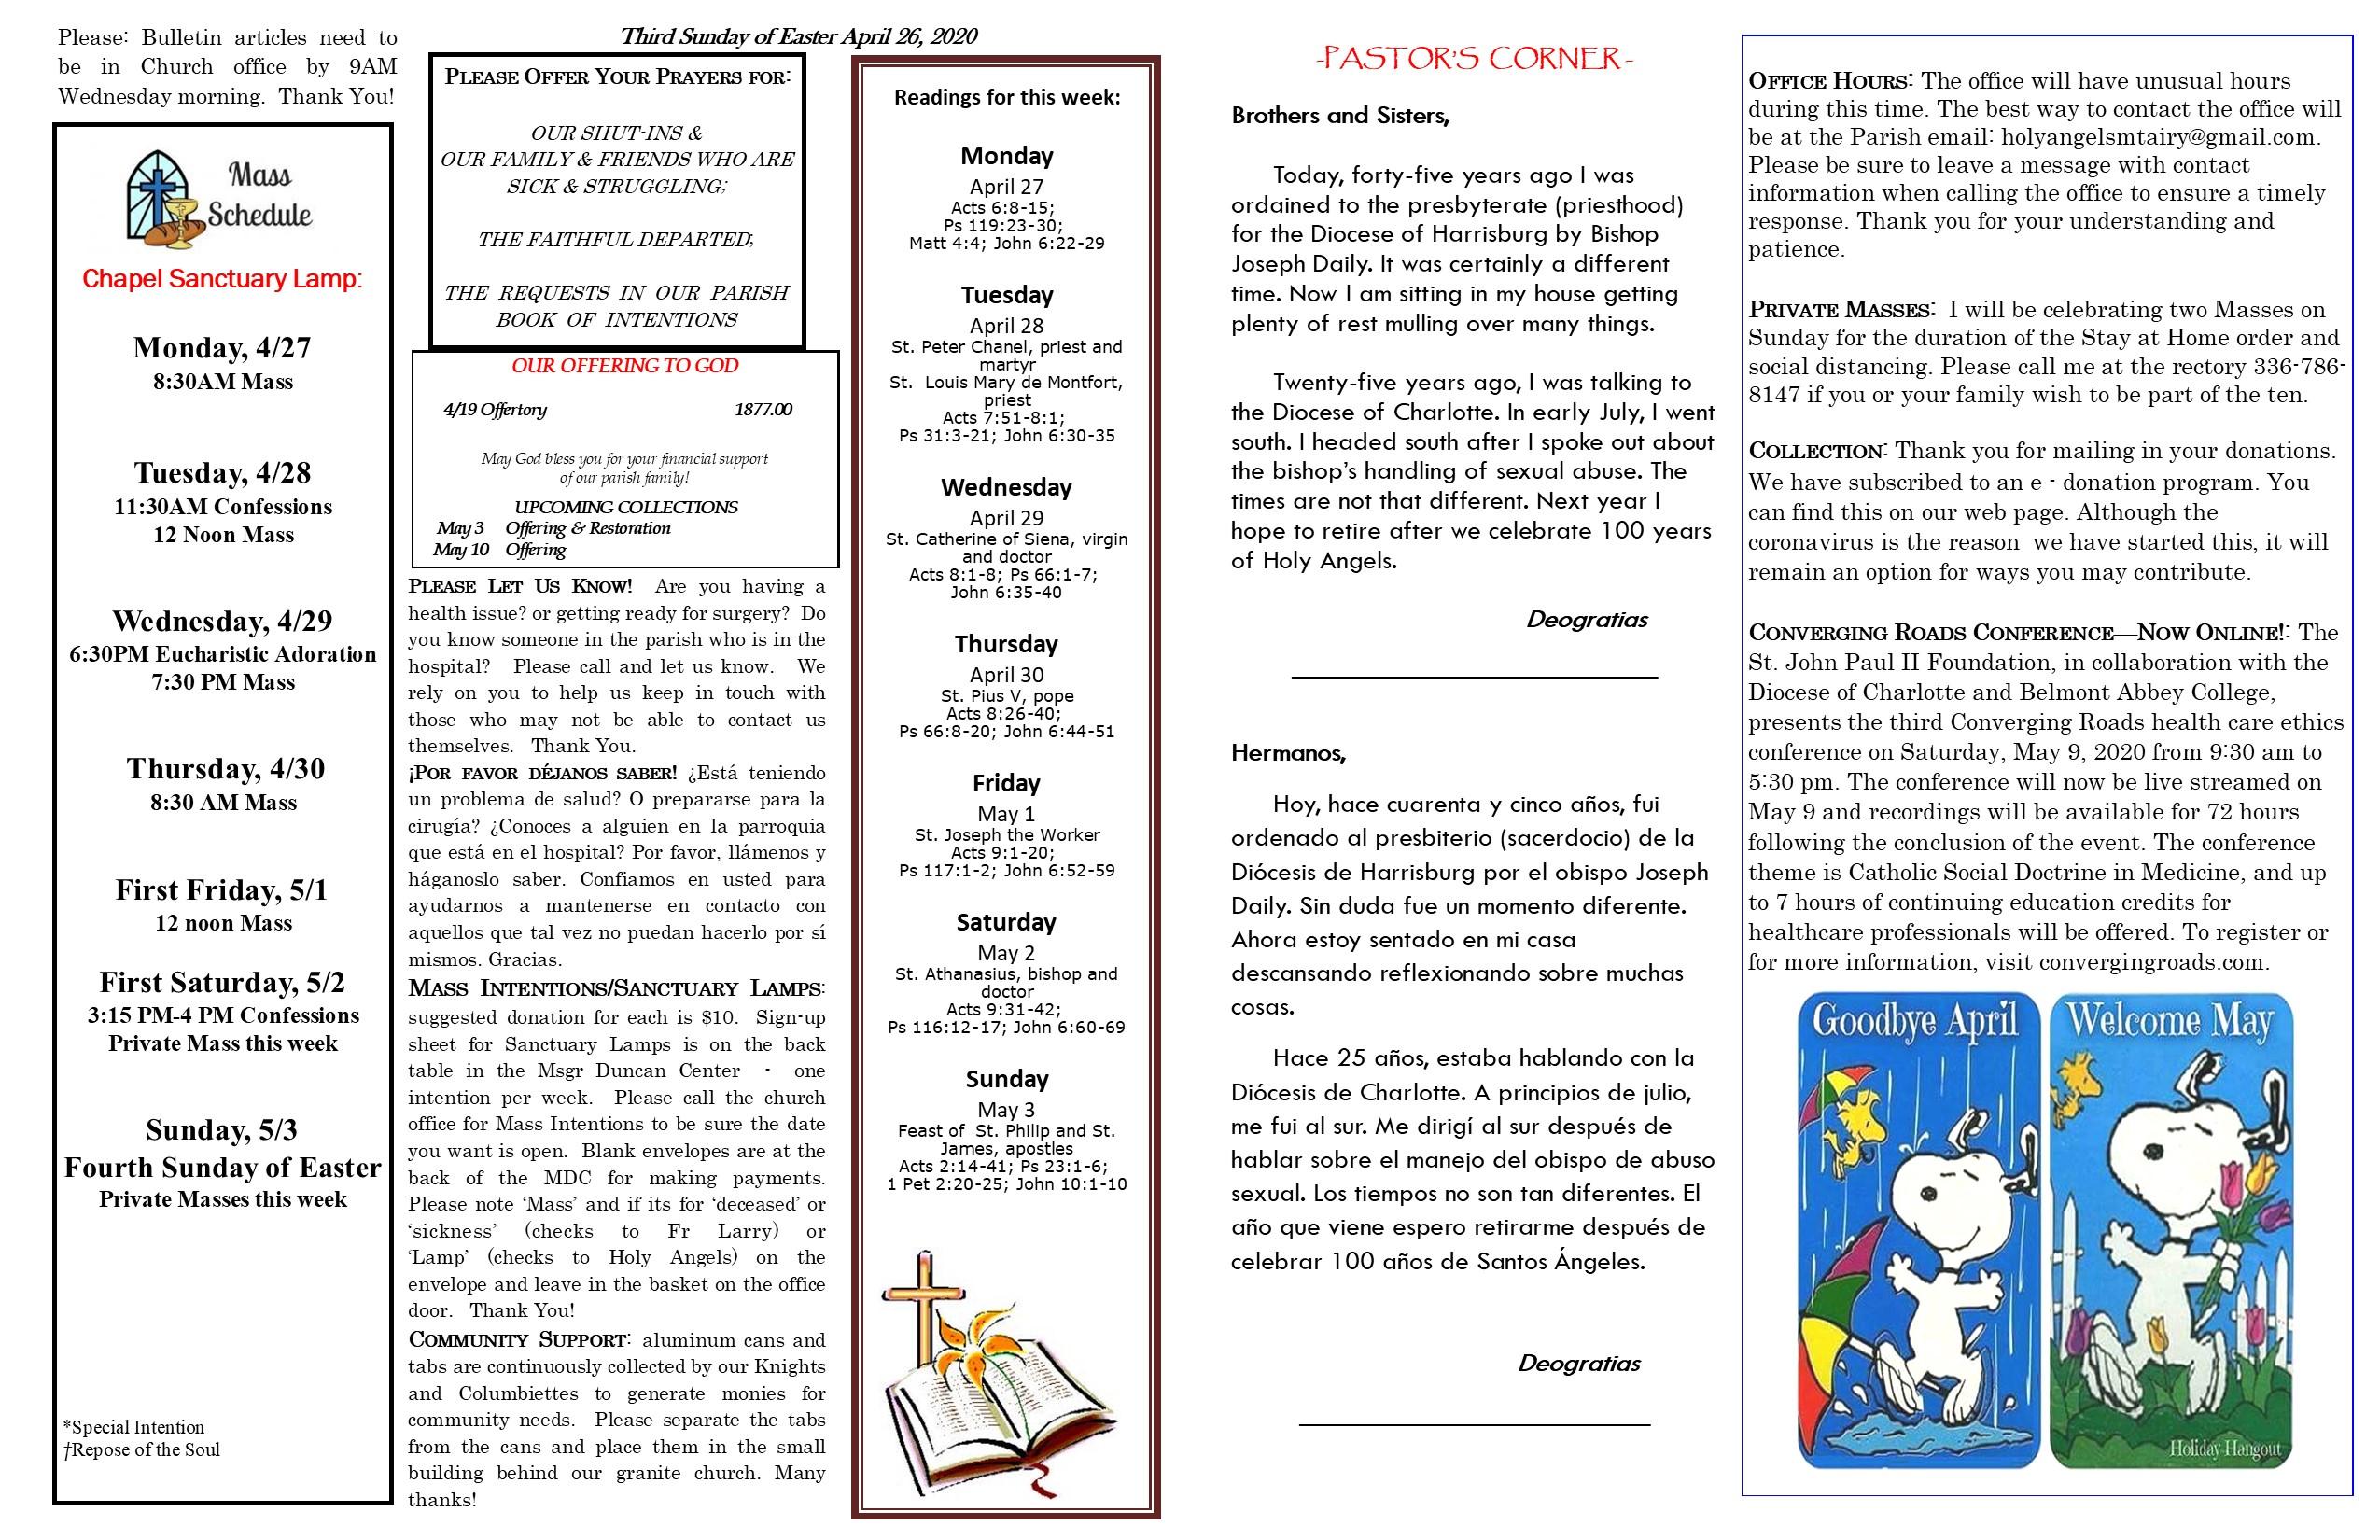 April 26 2020 page 2.jpg